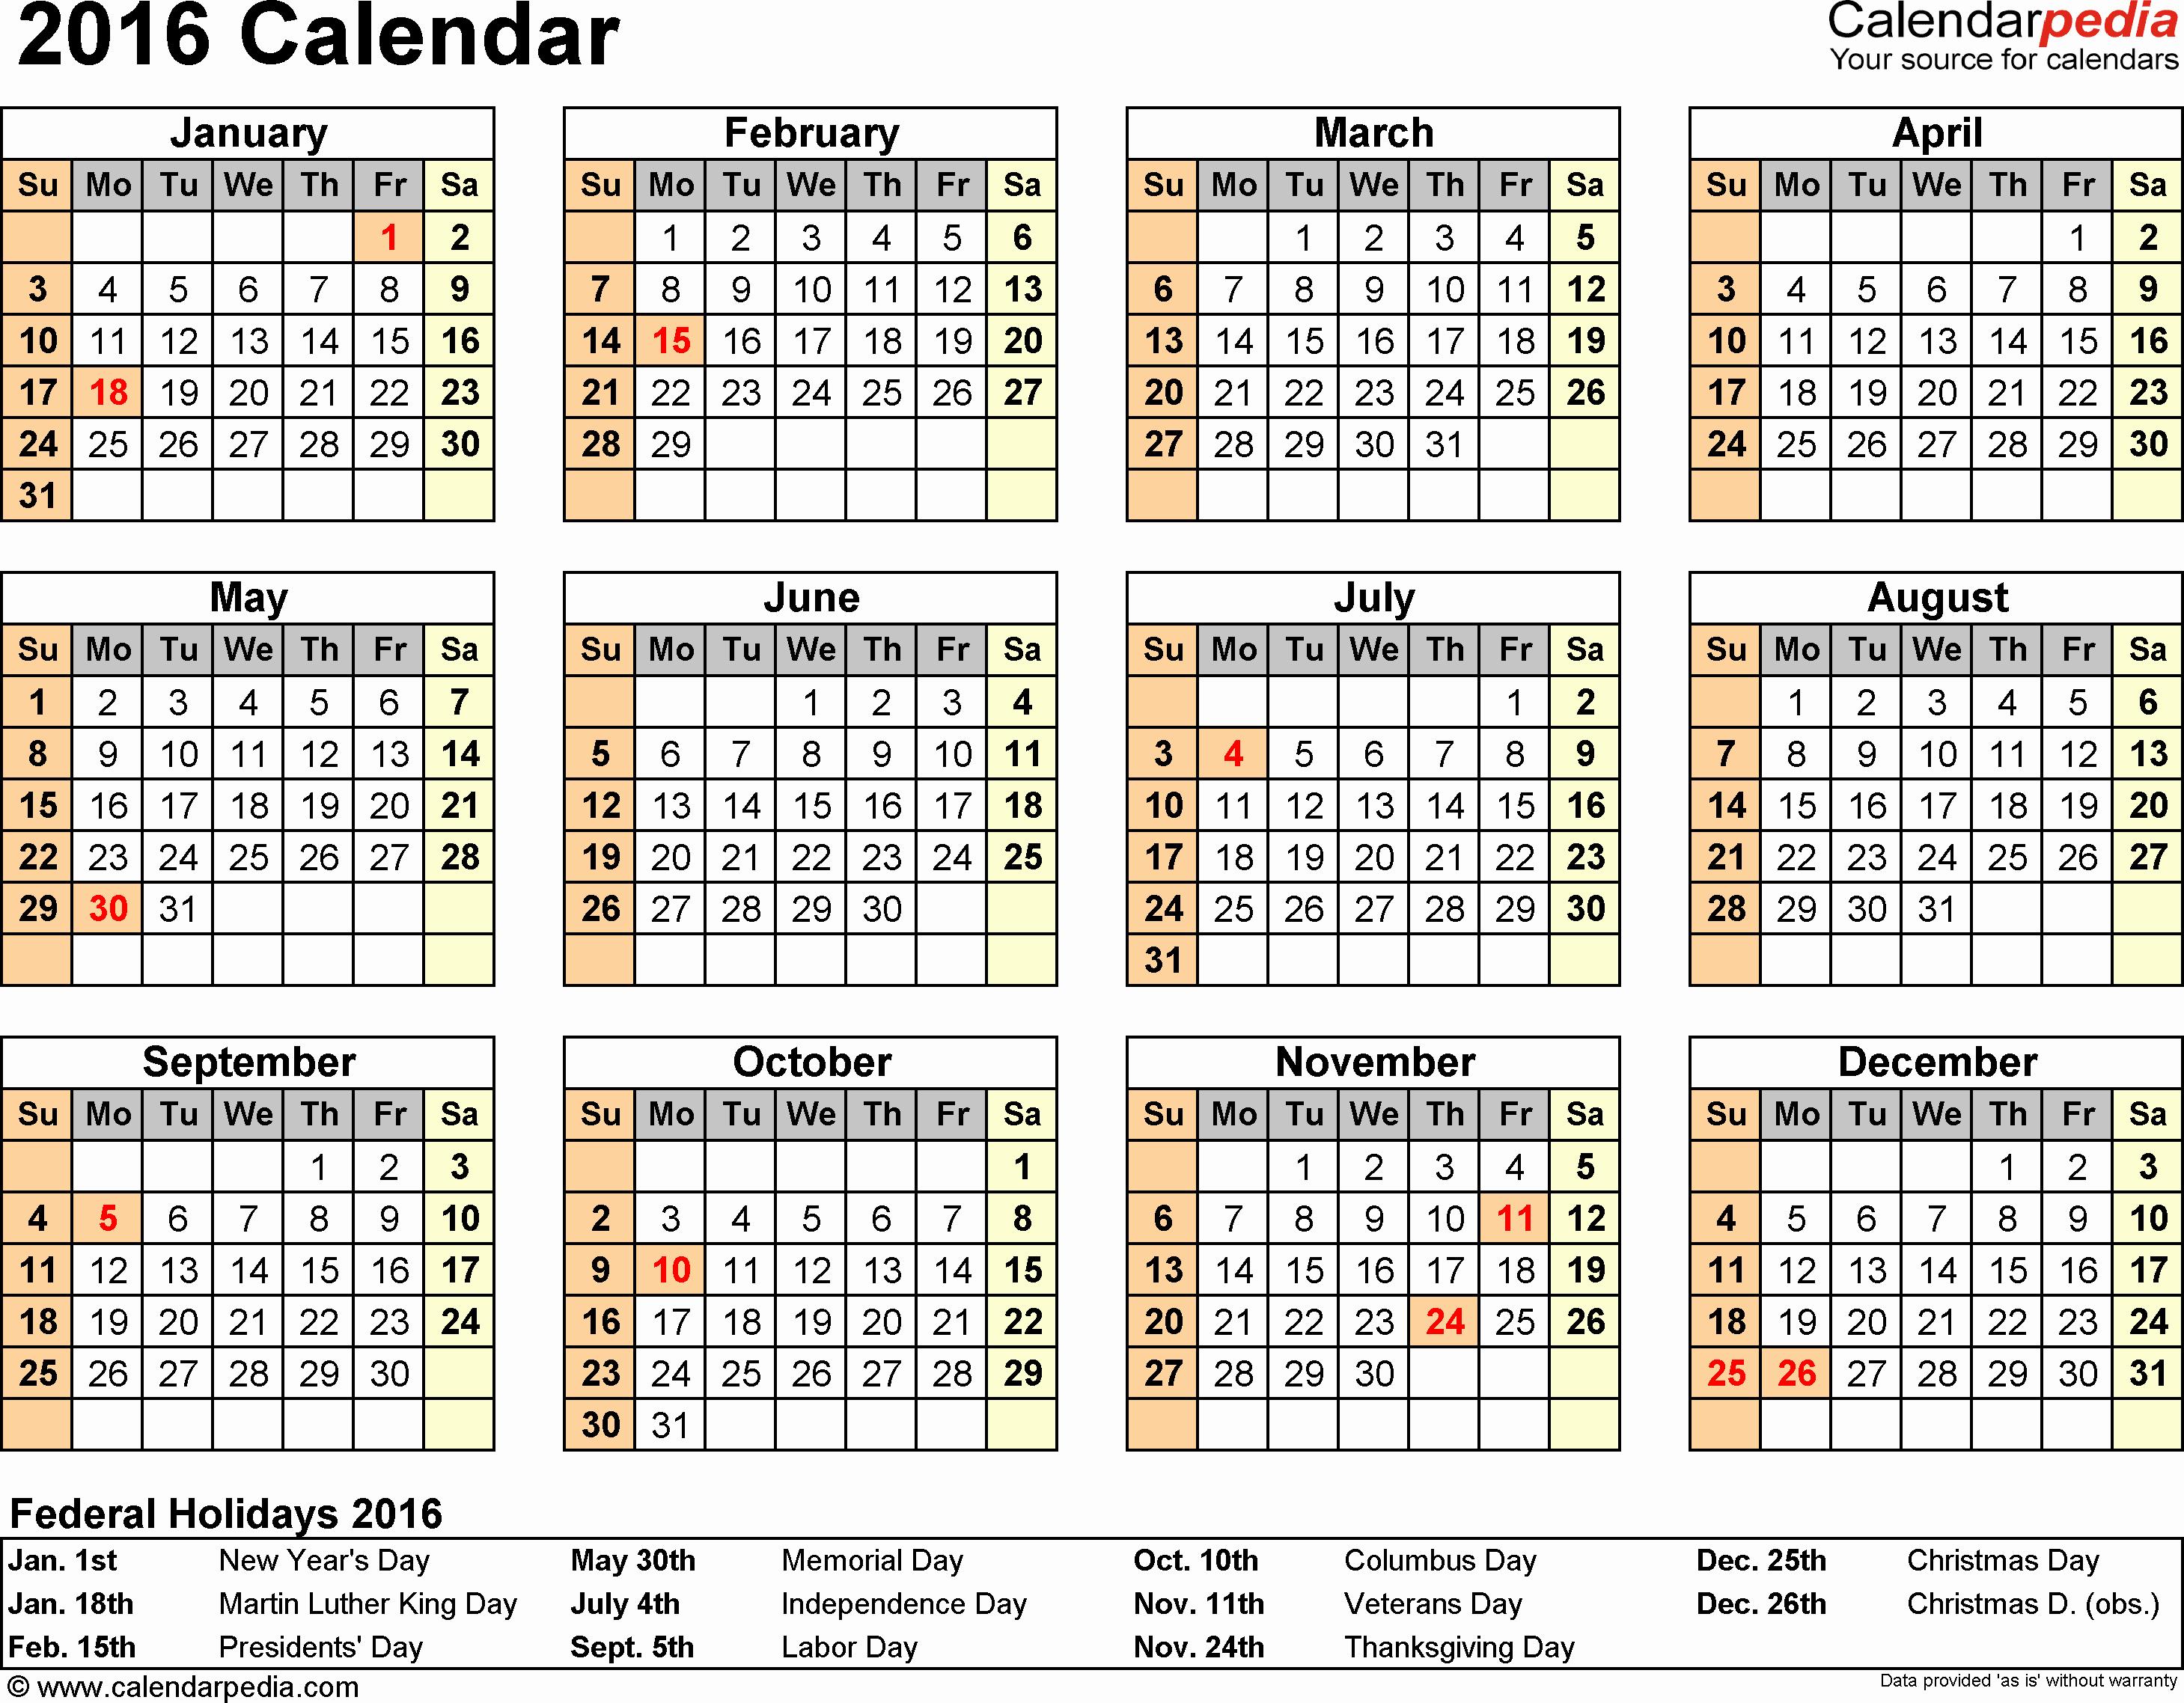 Monthly Calendar 2016 Printable Free Elegant 2016 Monthly Calendar Printable – 2017 Printable Calendar